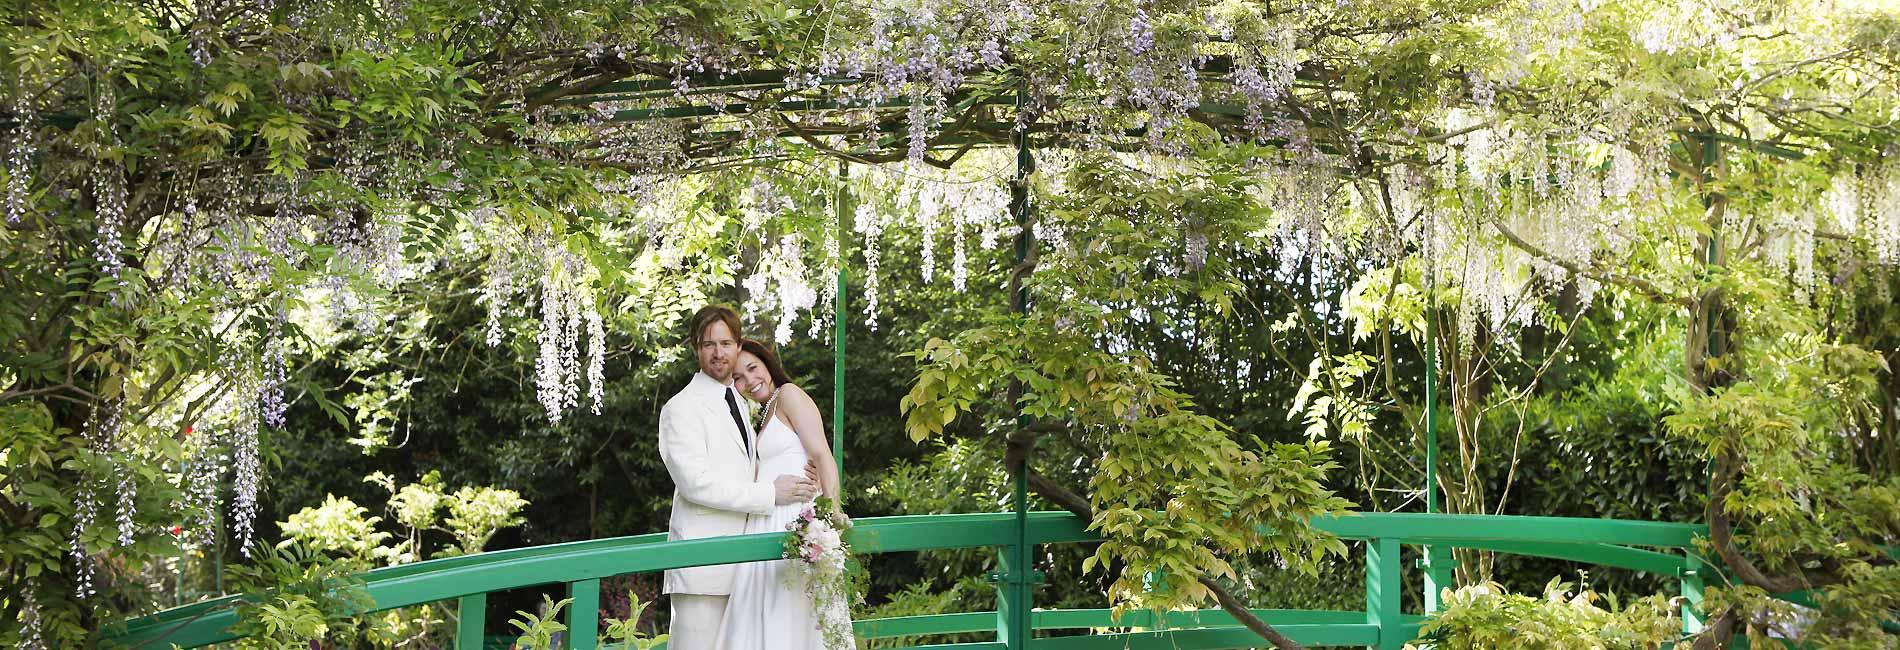 Photographe mariage Giverny